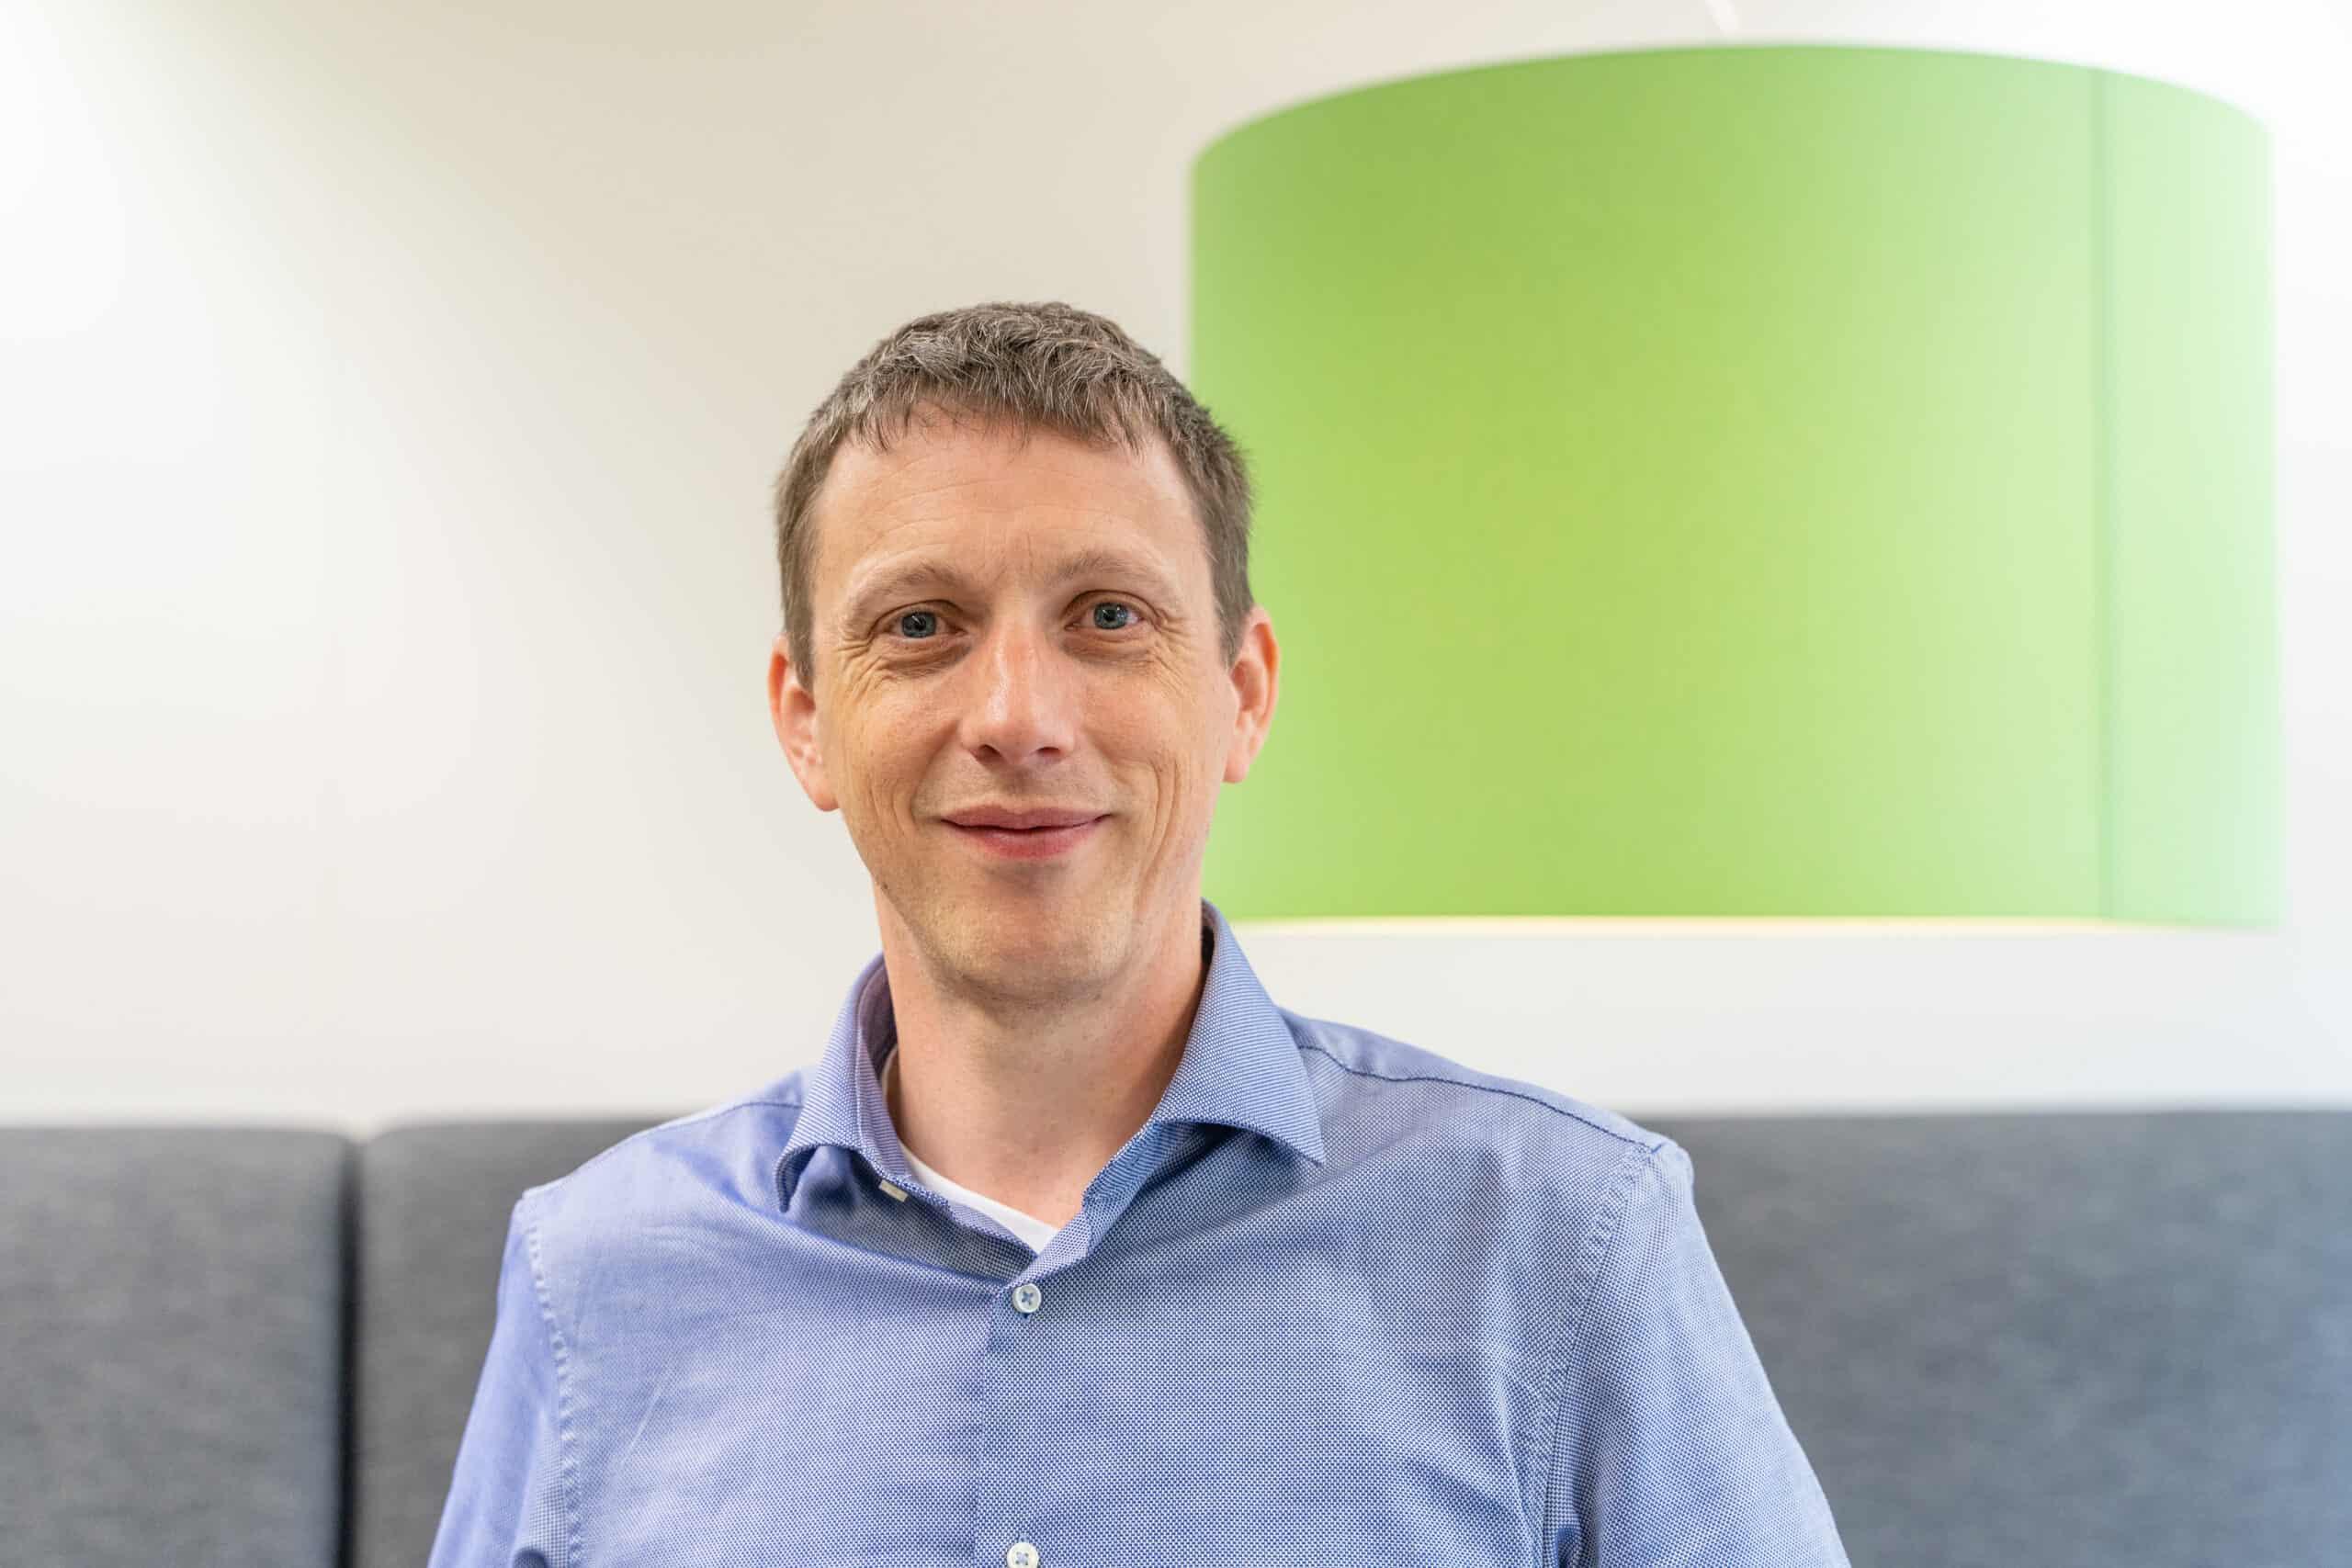 Rob Leijenaar, performancetest expert bij Polteq